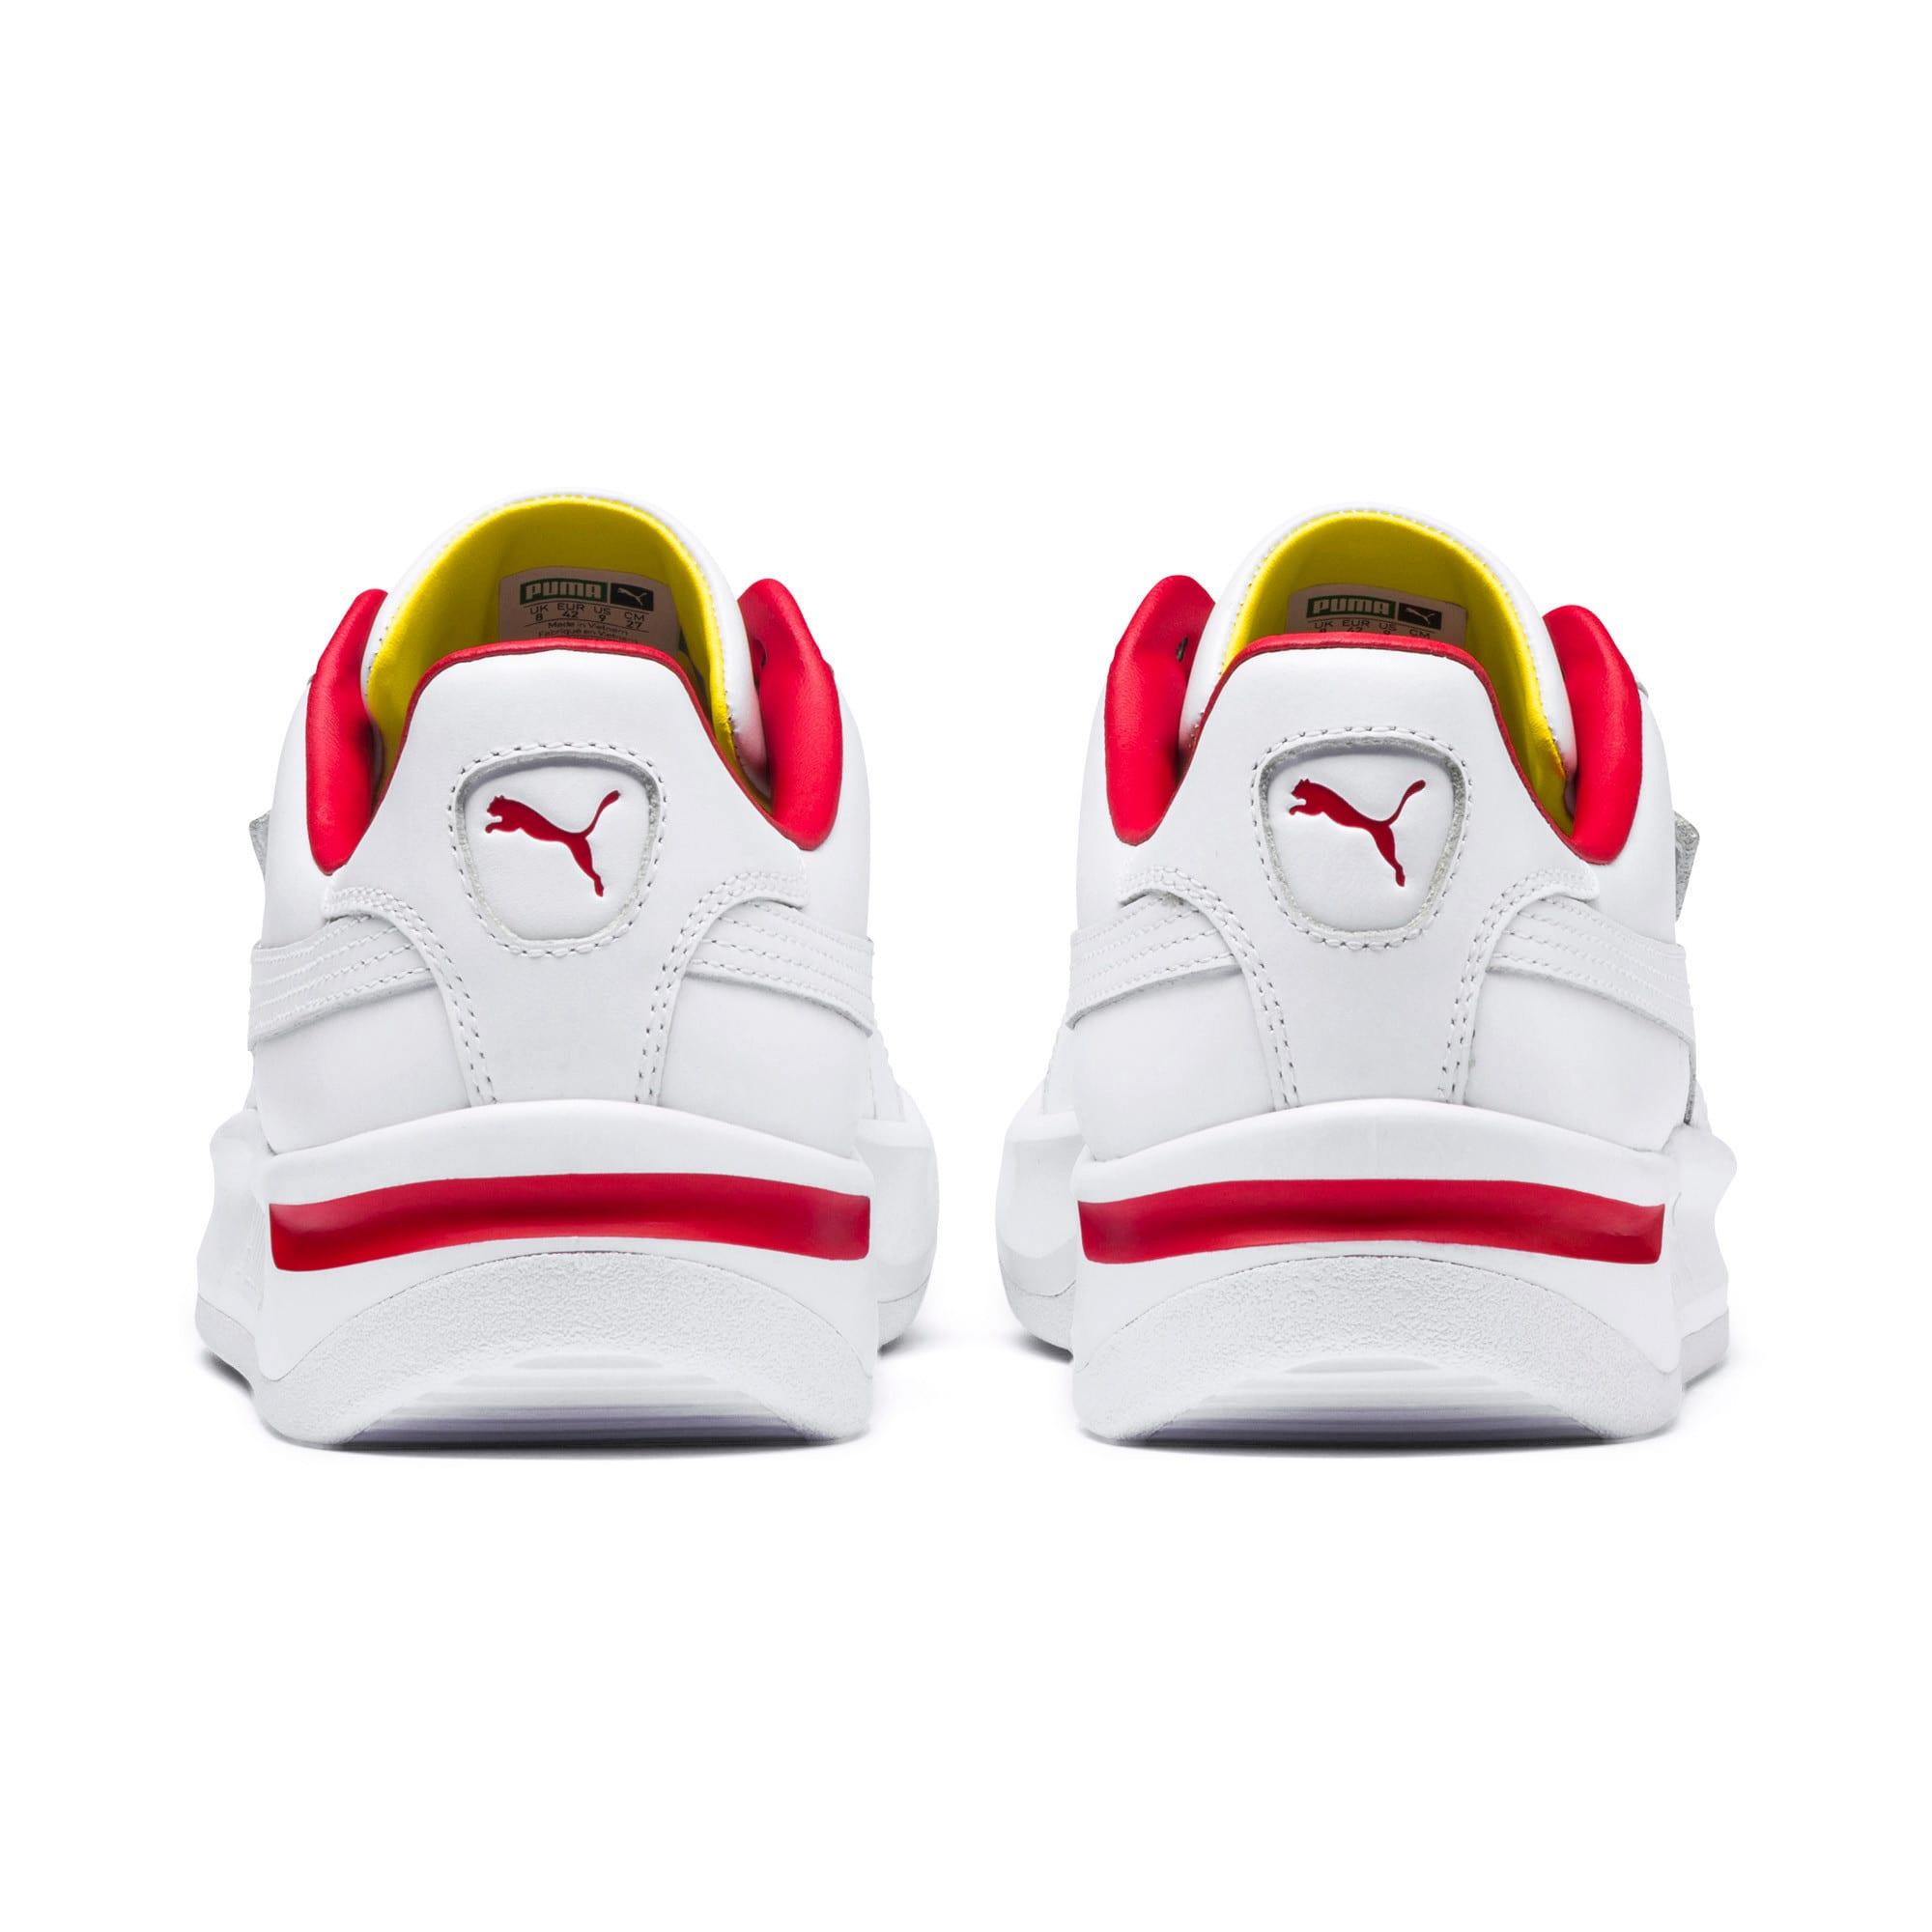 Thumbnail 4 of California Drive Thru Shoes, P Wht-HighRiskRed-Blazg Yelw, medium